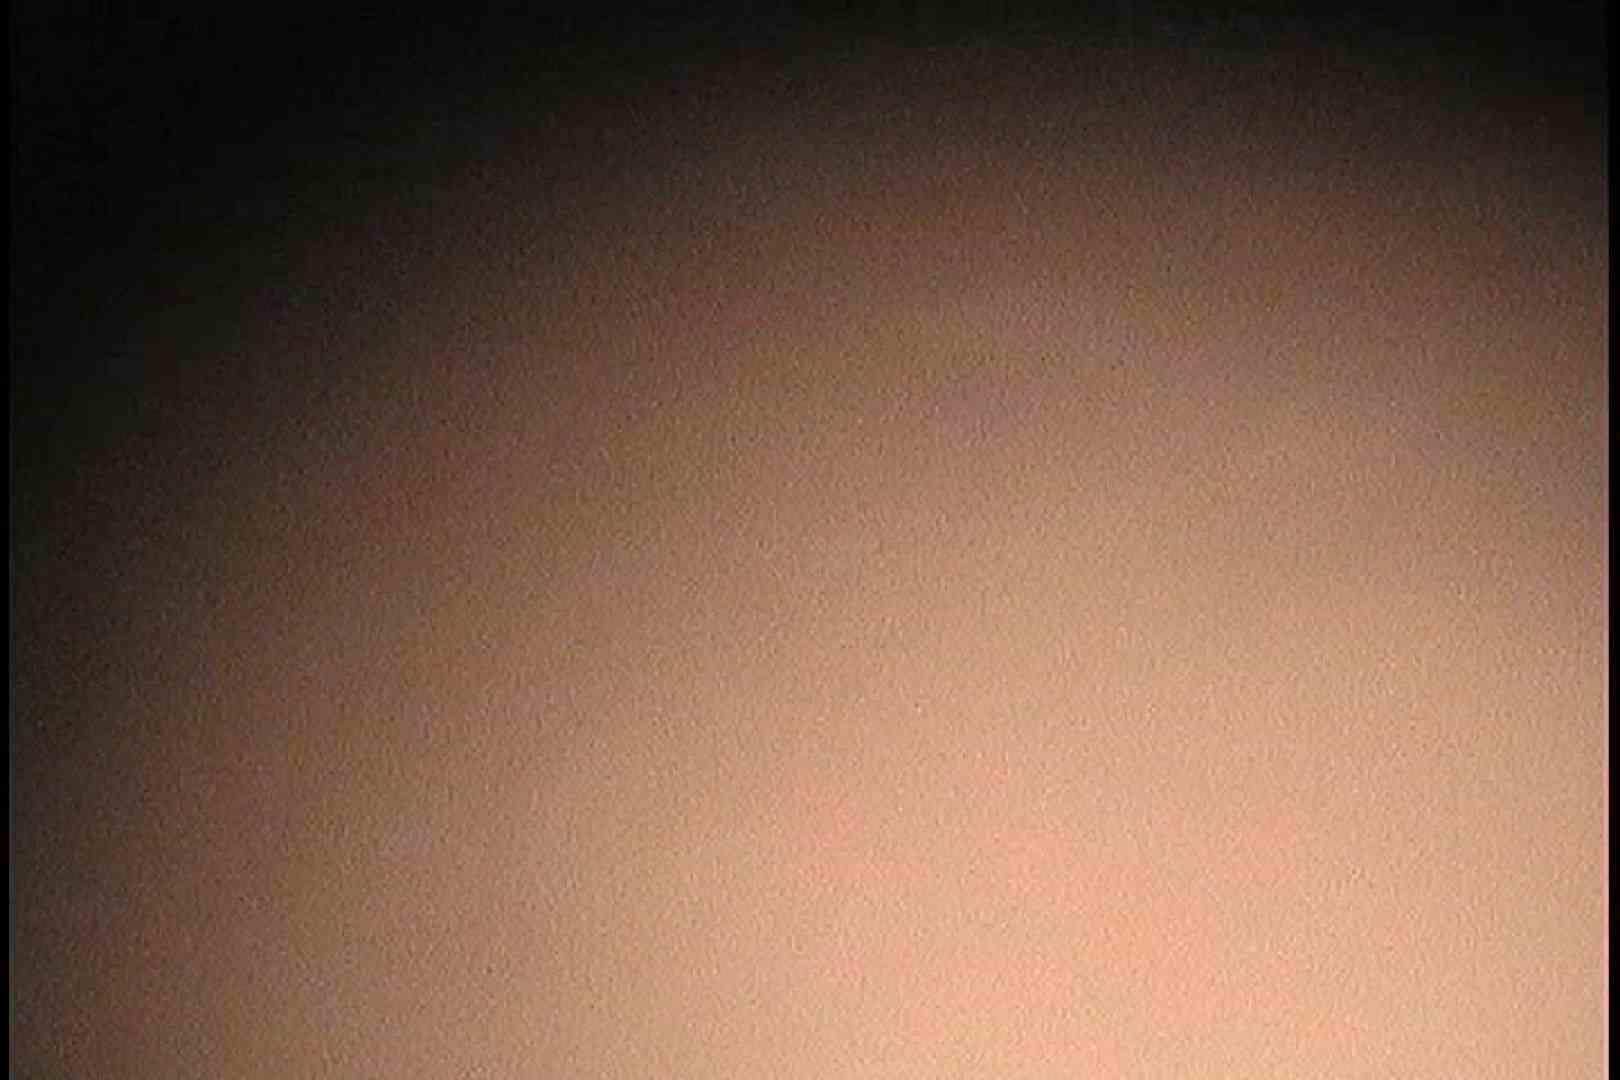 No.95 陰毛のその奥に茎がしっかりと!! 乙女もsex おめこ無修正動画無料 102枚 46